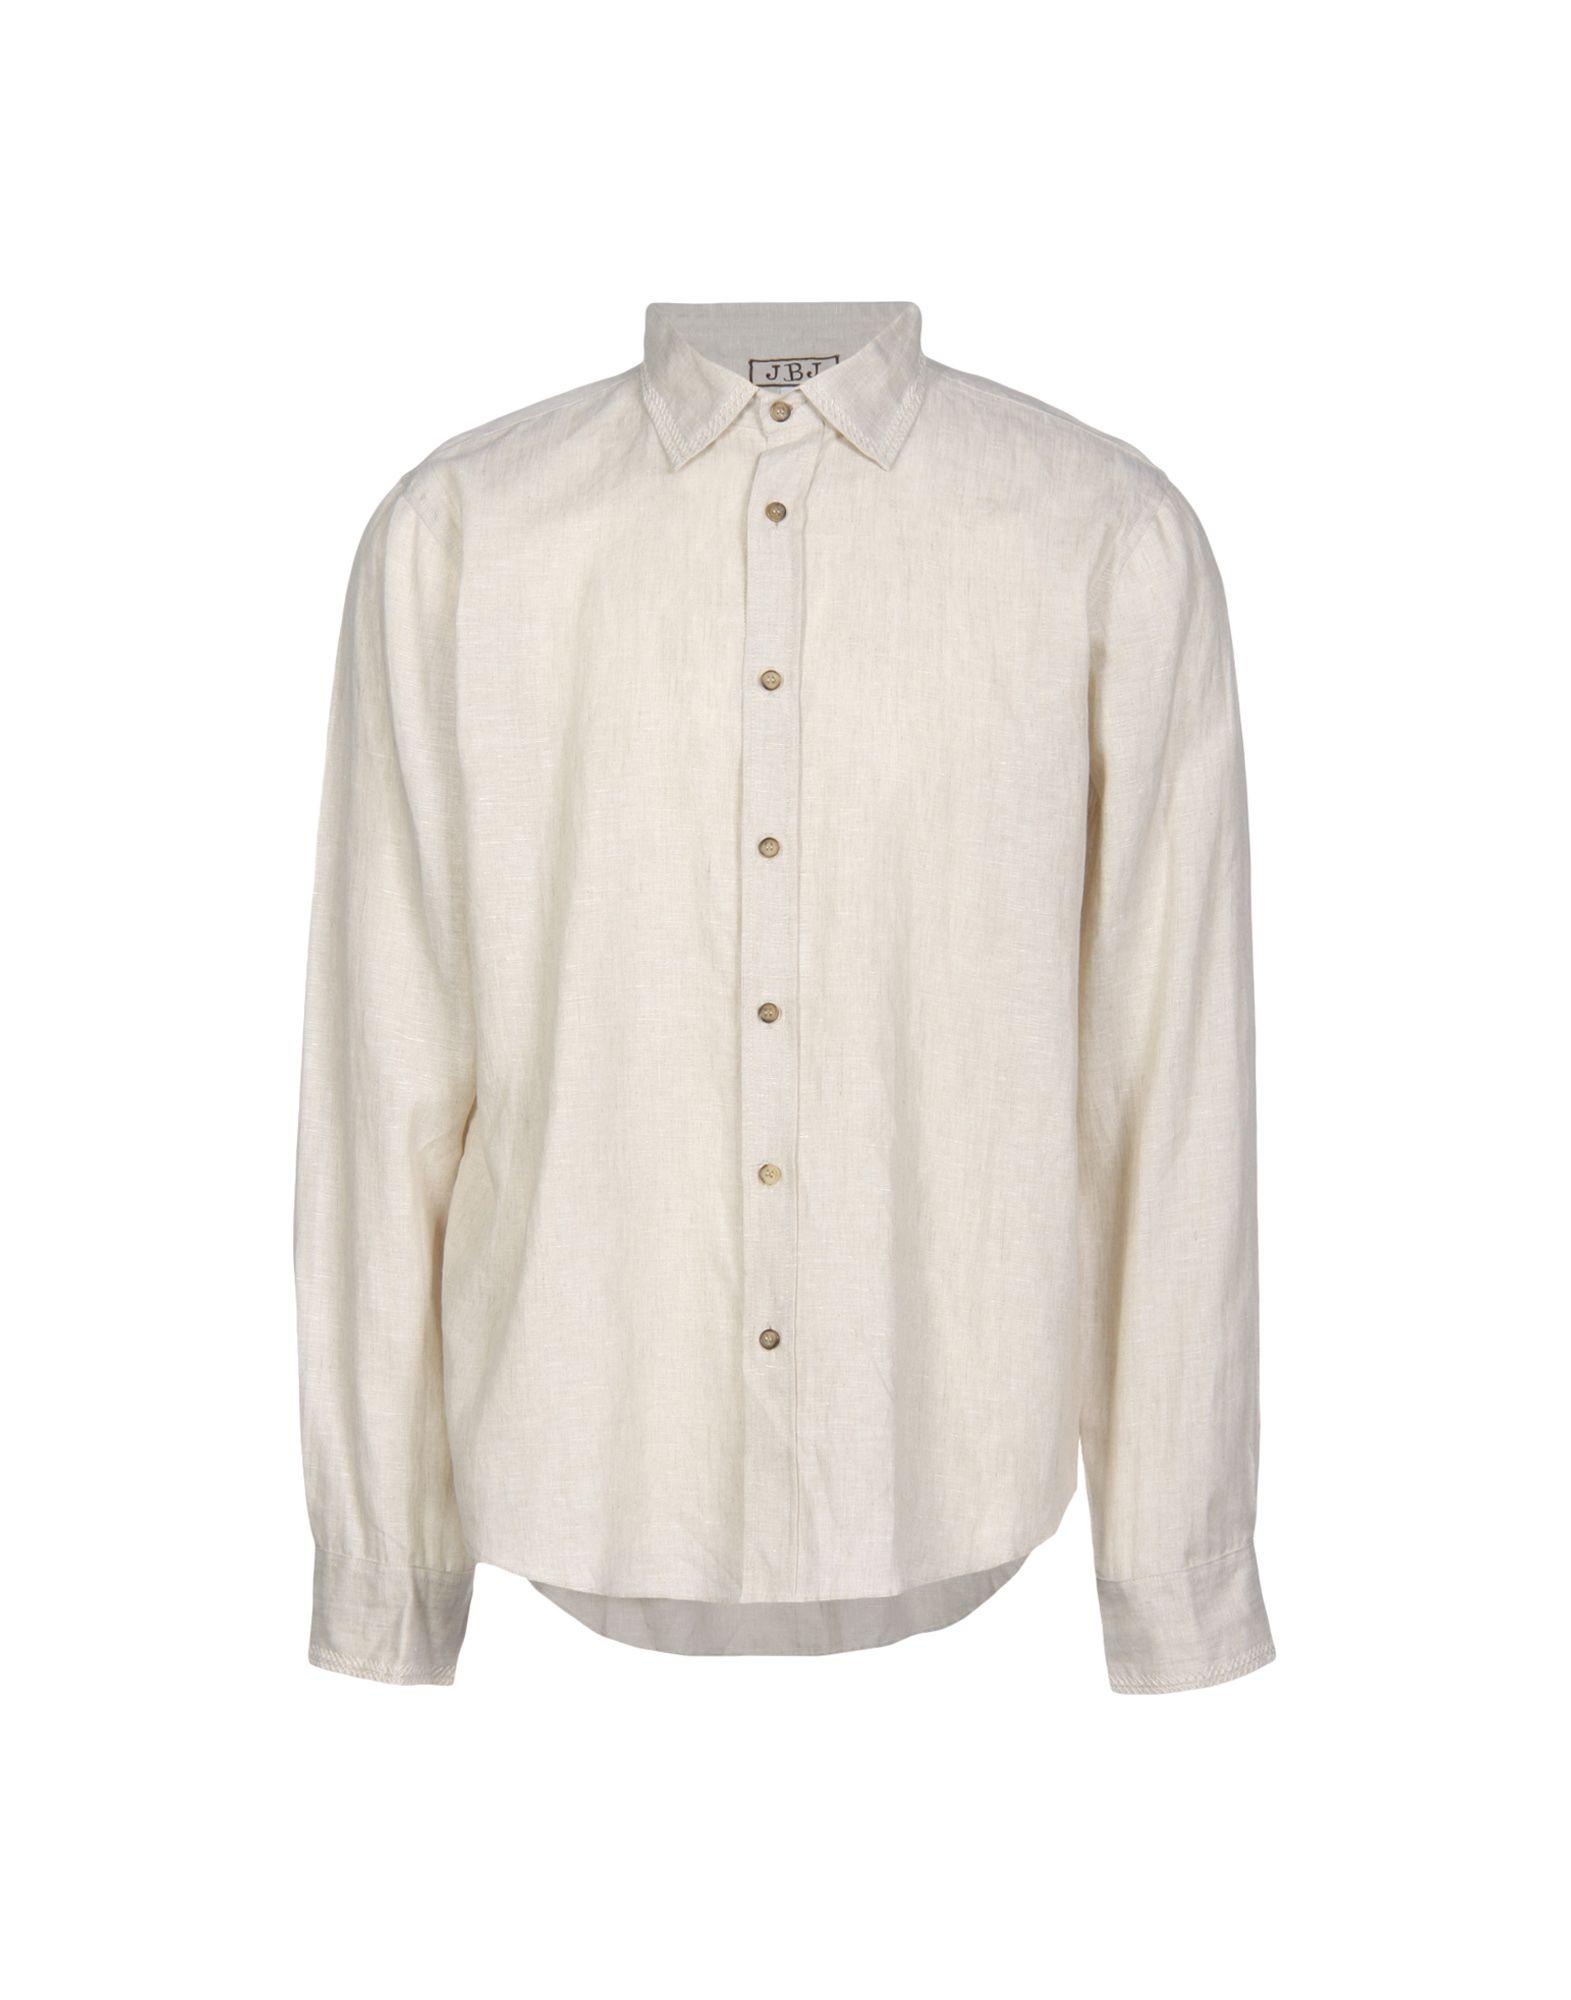 JUPE BY JACKIE Linen Shirt in Beige